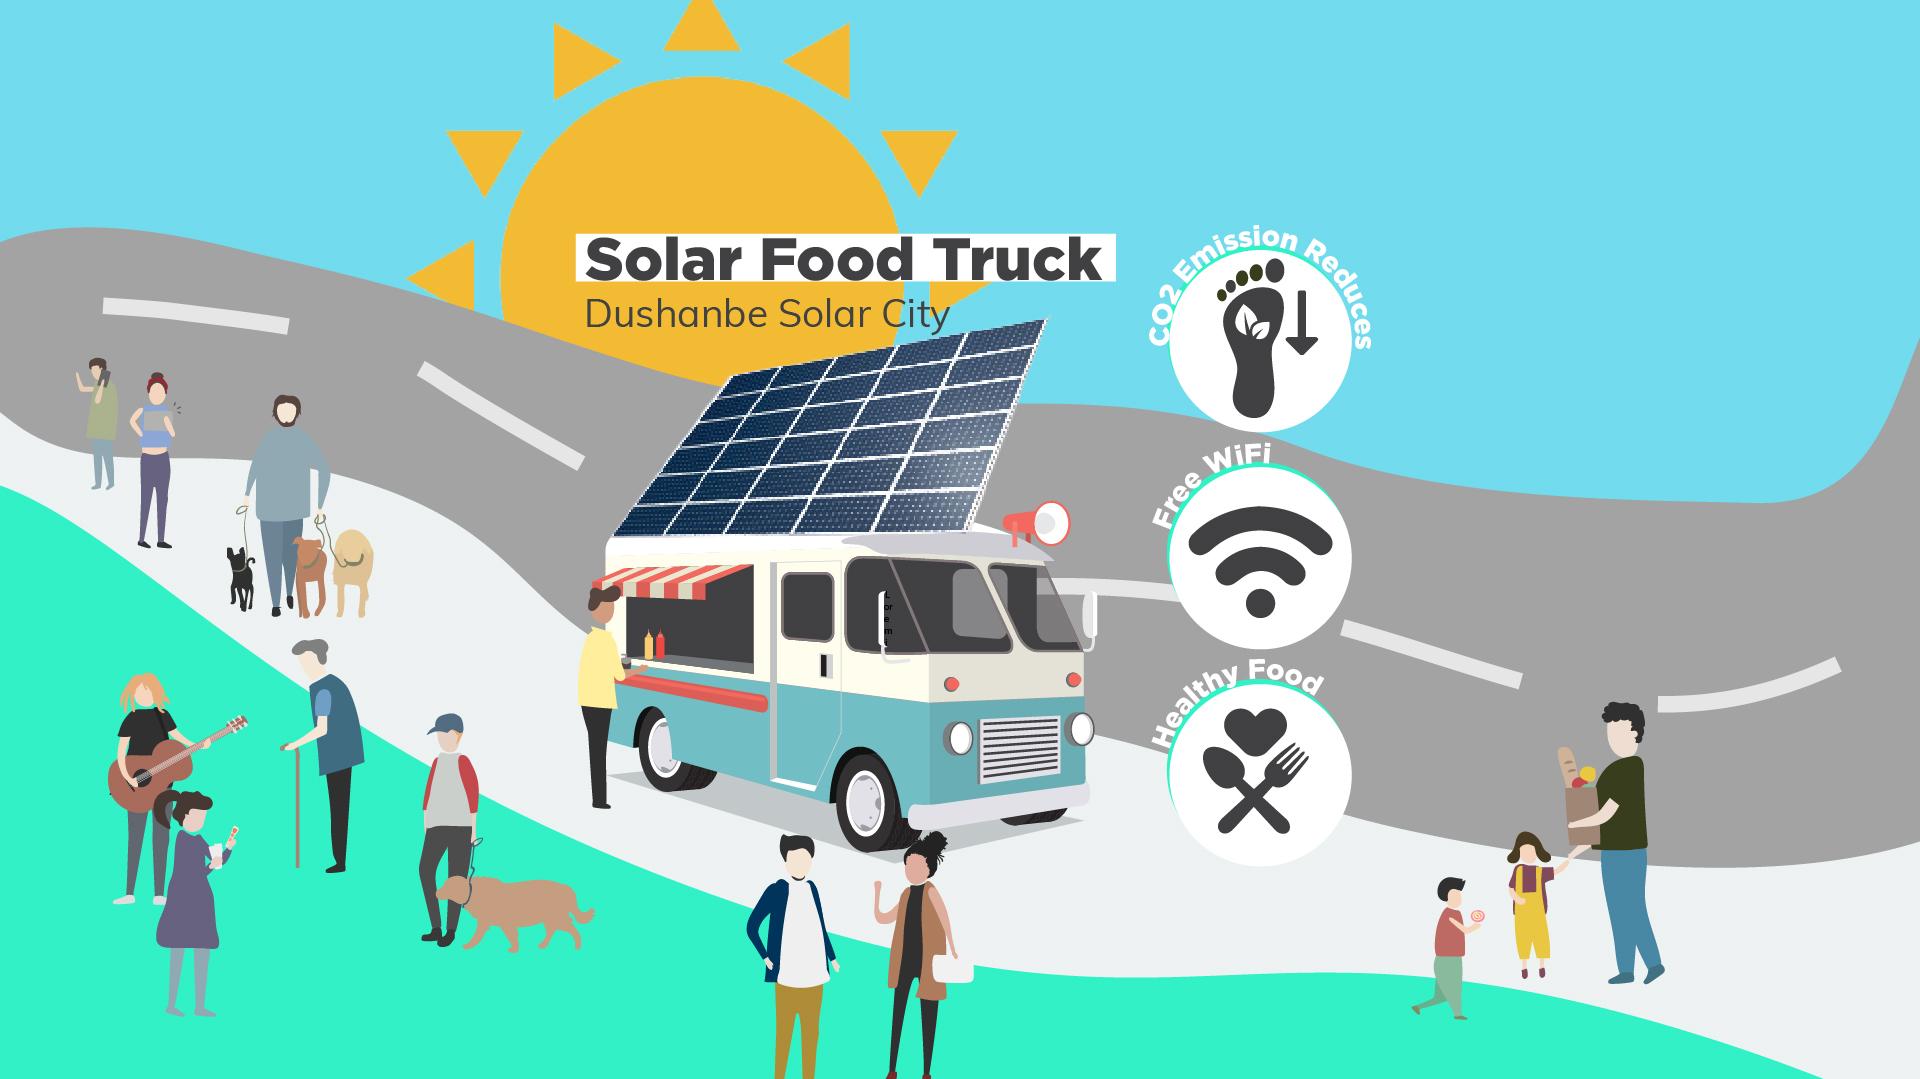 Cities Unite To Start Solar Revolution Through Crowdfunding